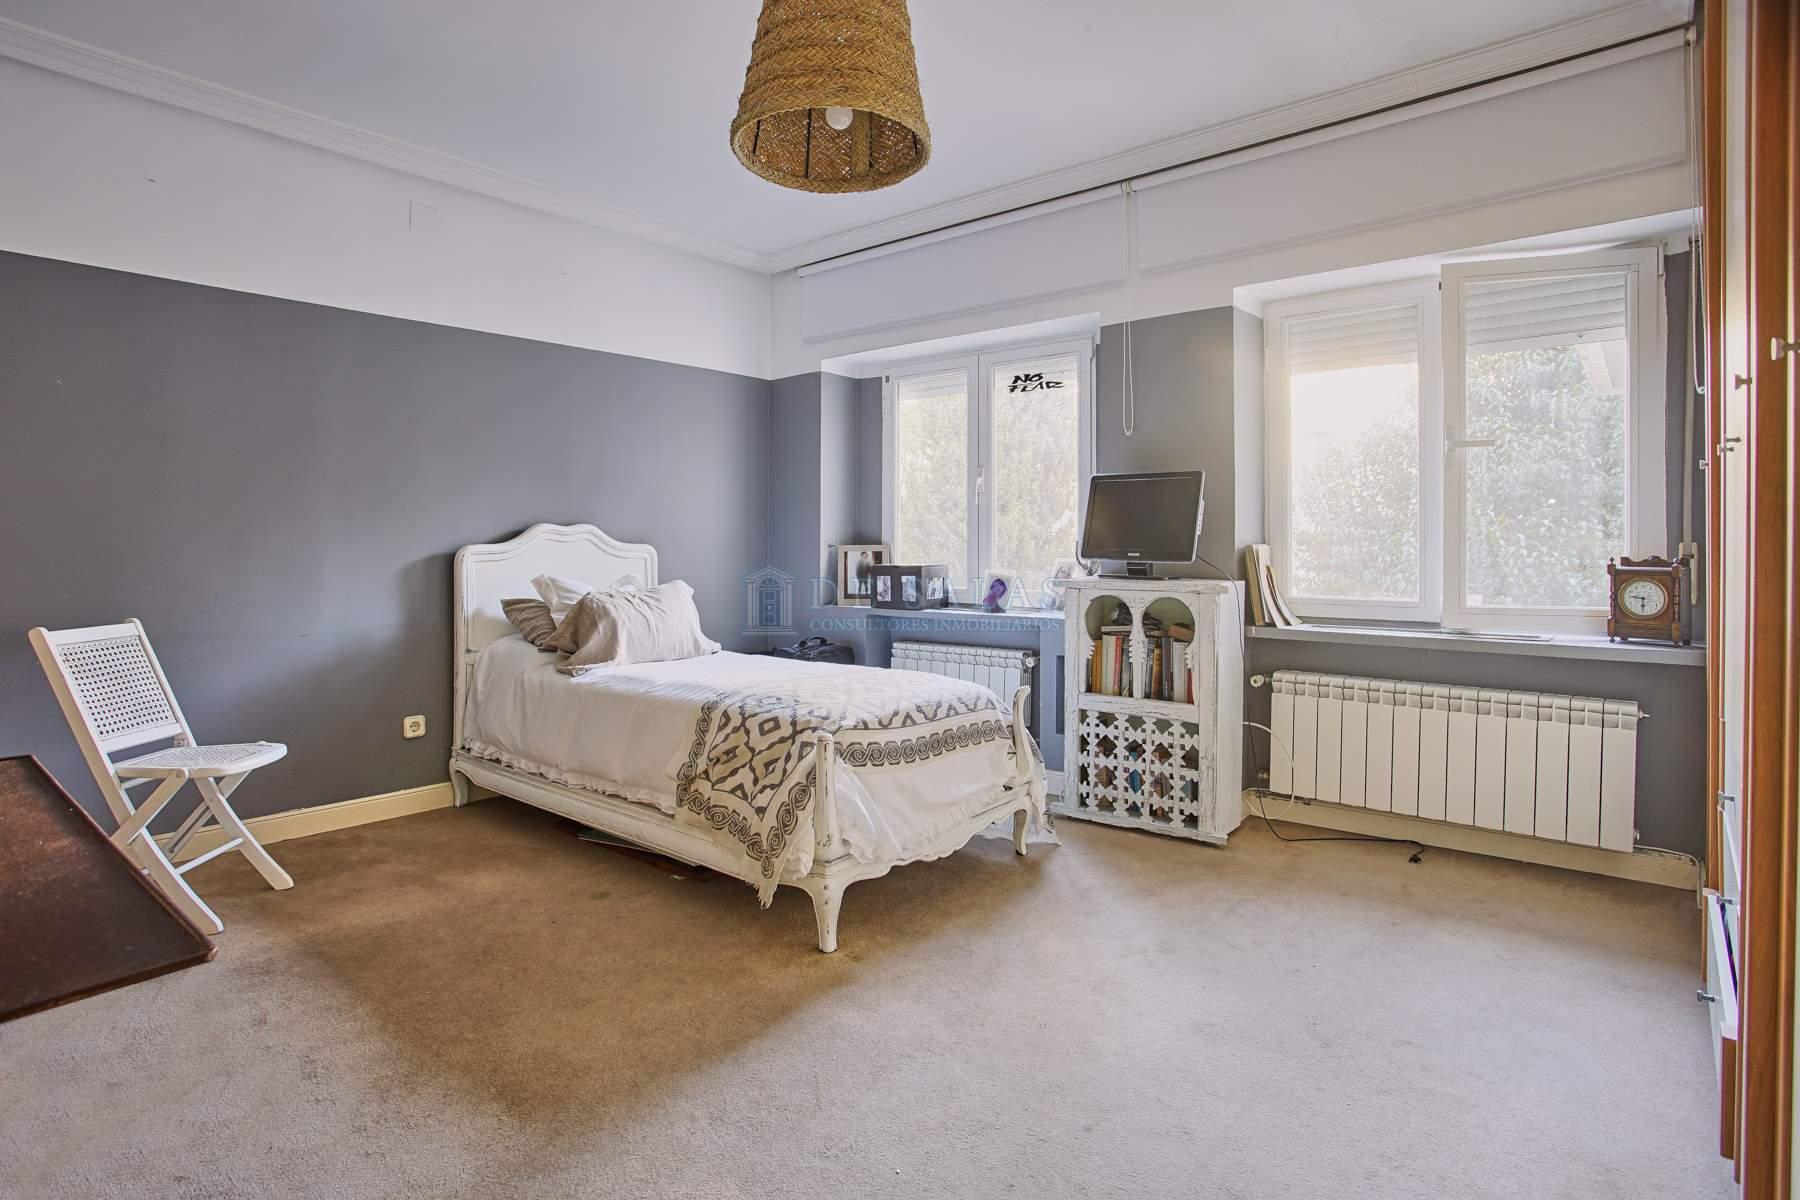 Dormitorio-10 Piso Soto de la Moraleja